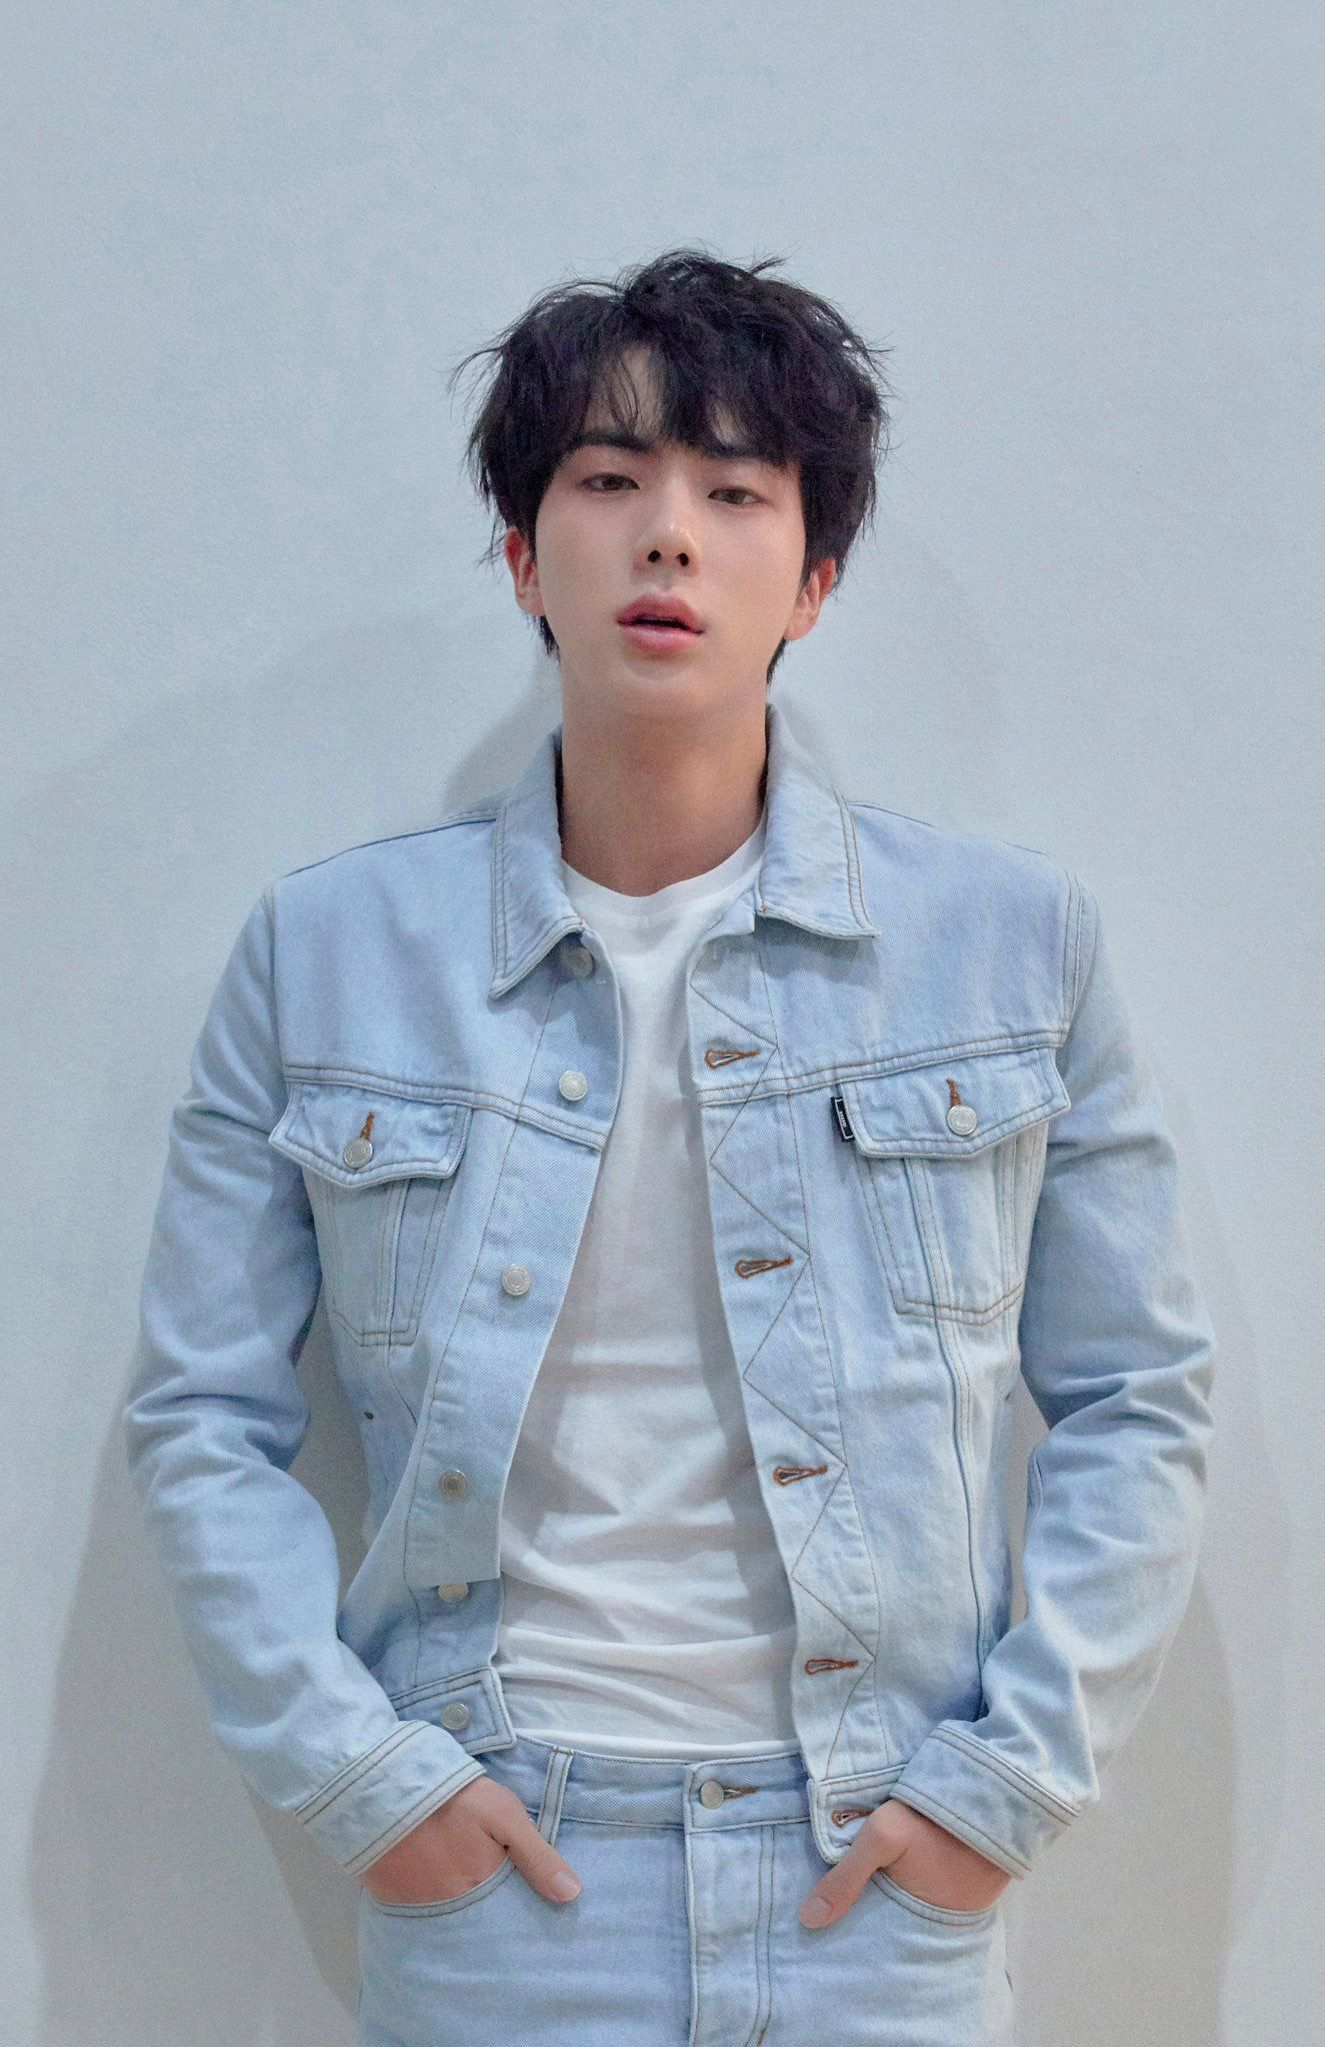 Pin By On Seokjin Bts Jin Bts Concept Photo Worldwide Handsome